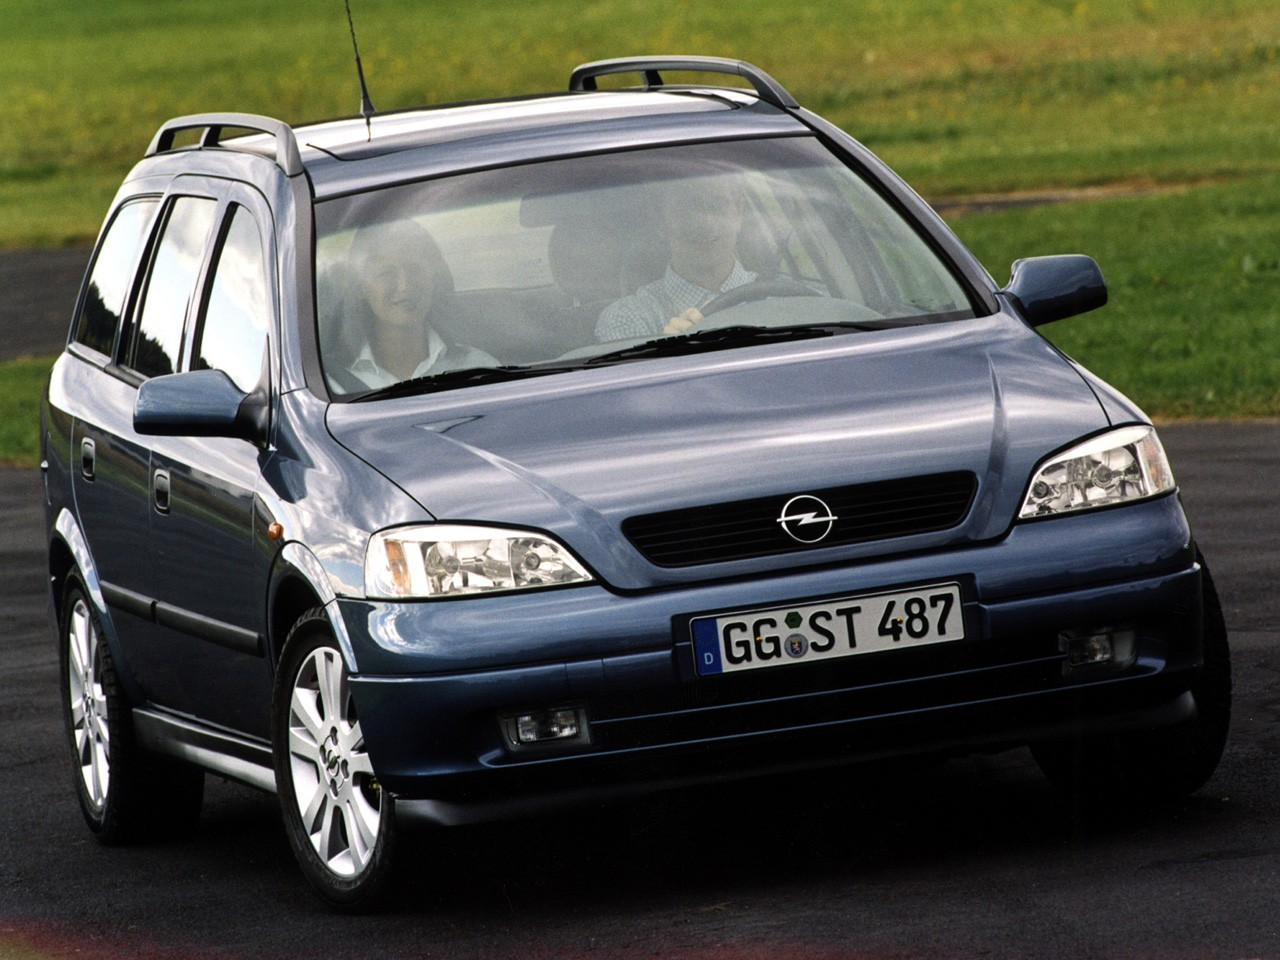 OPEL Astra Caravan 1998